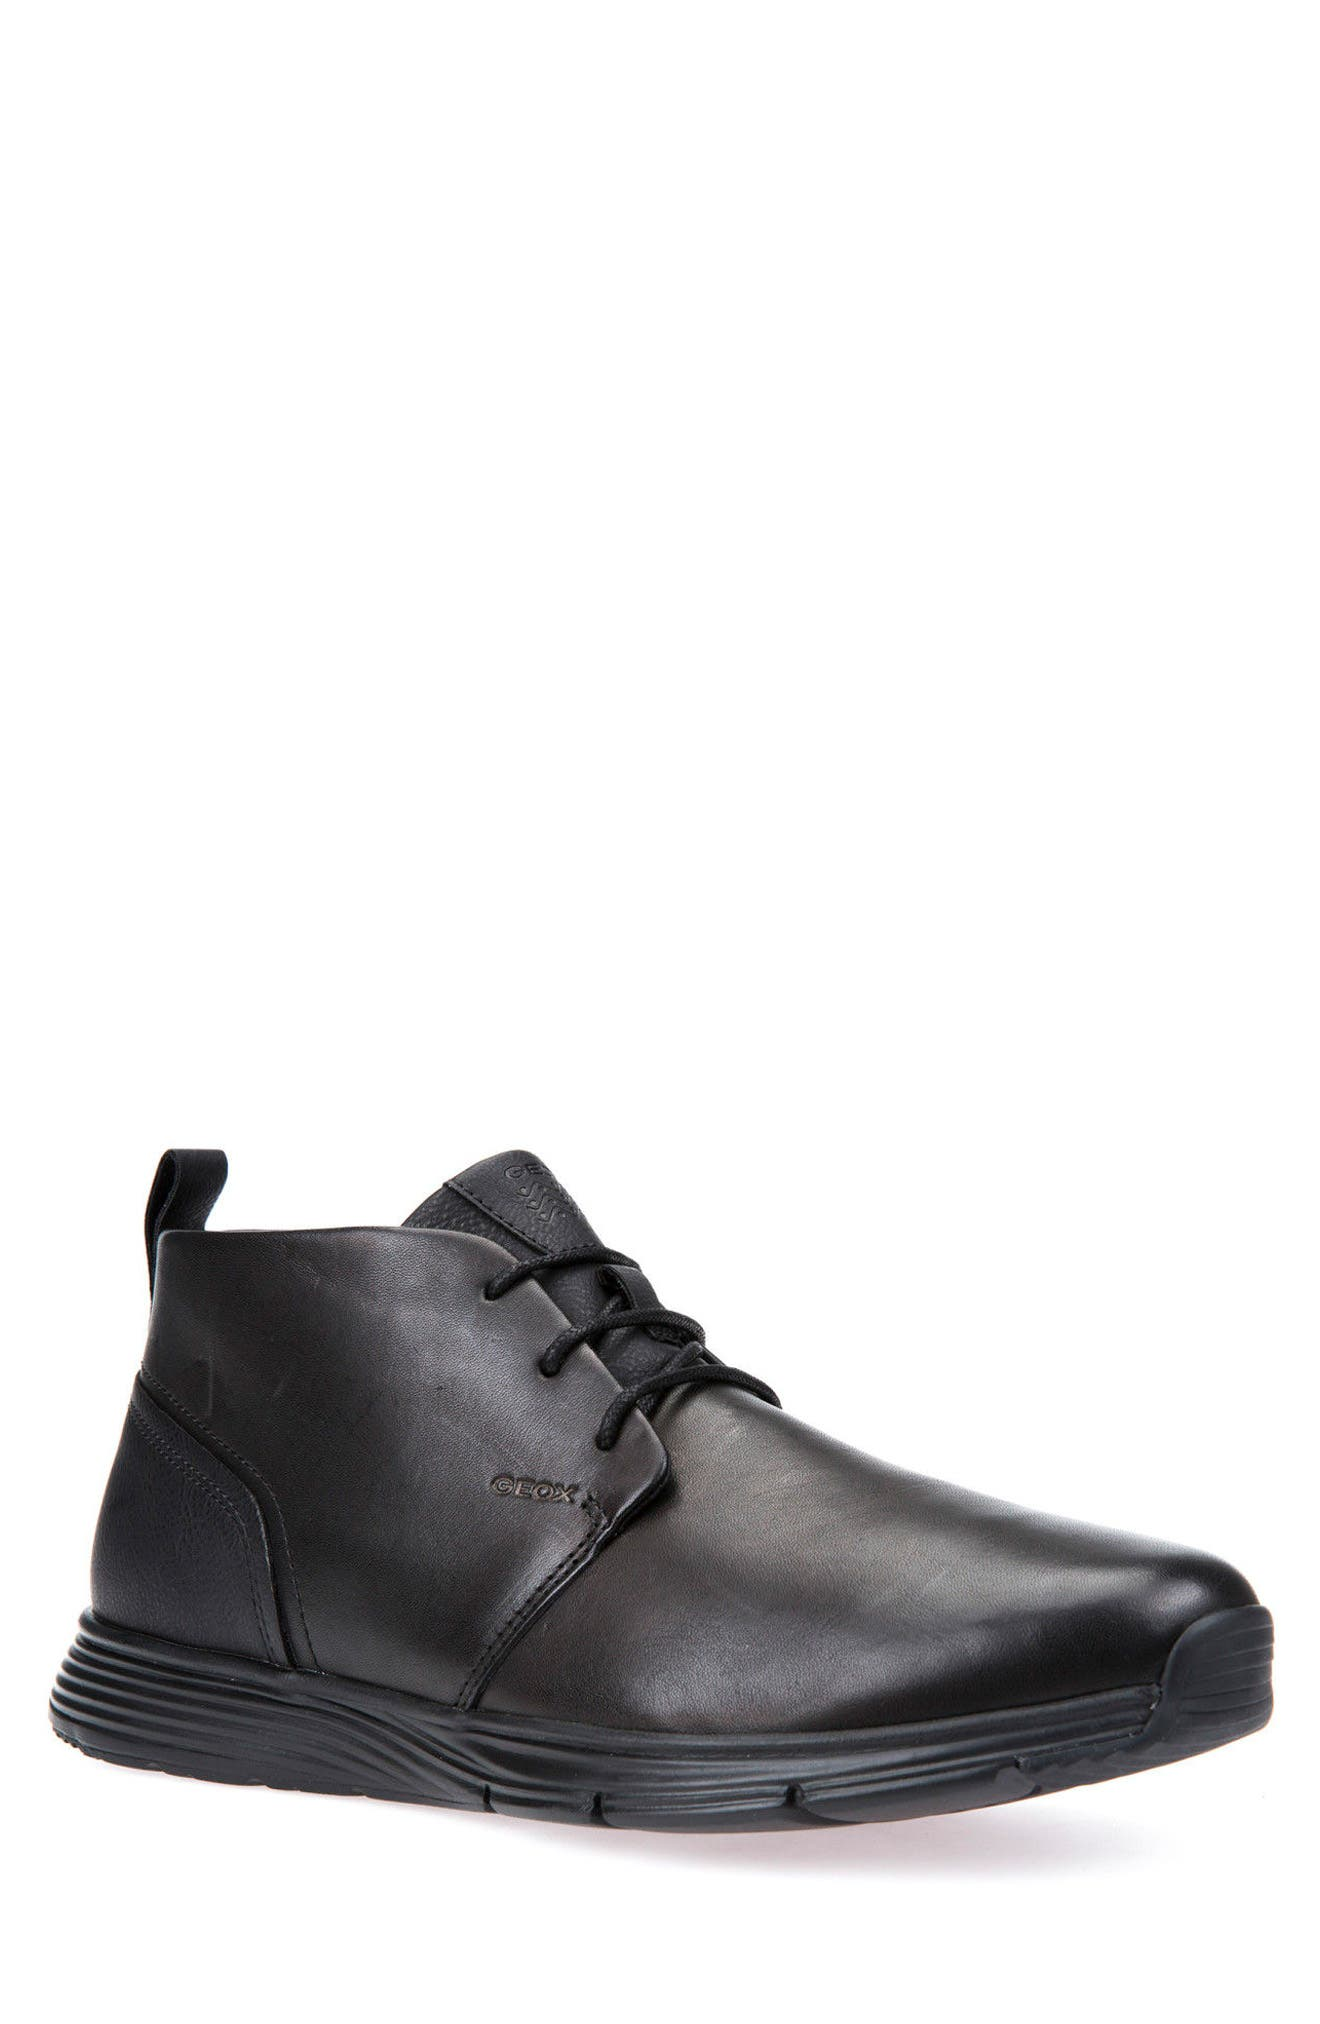 Snapish 7 Boot,                         Main,                         color,